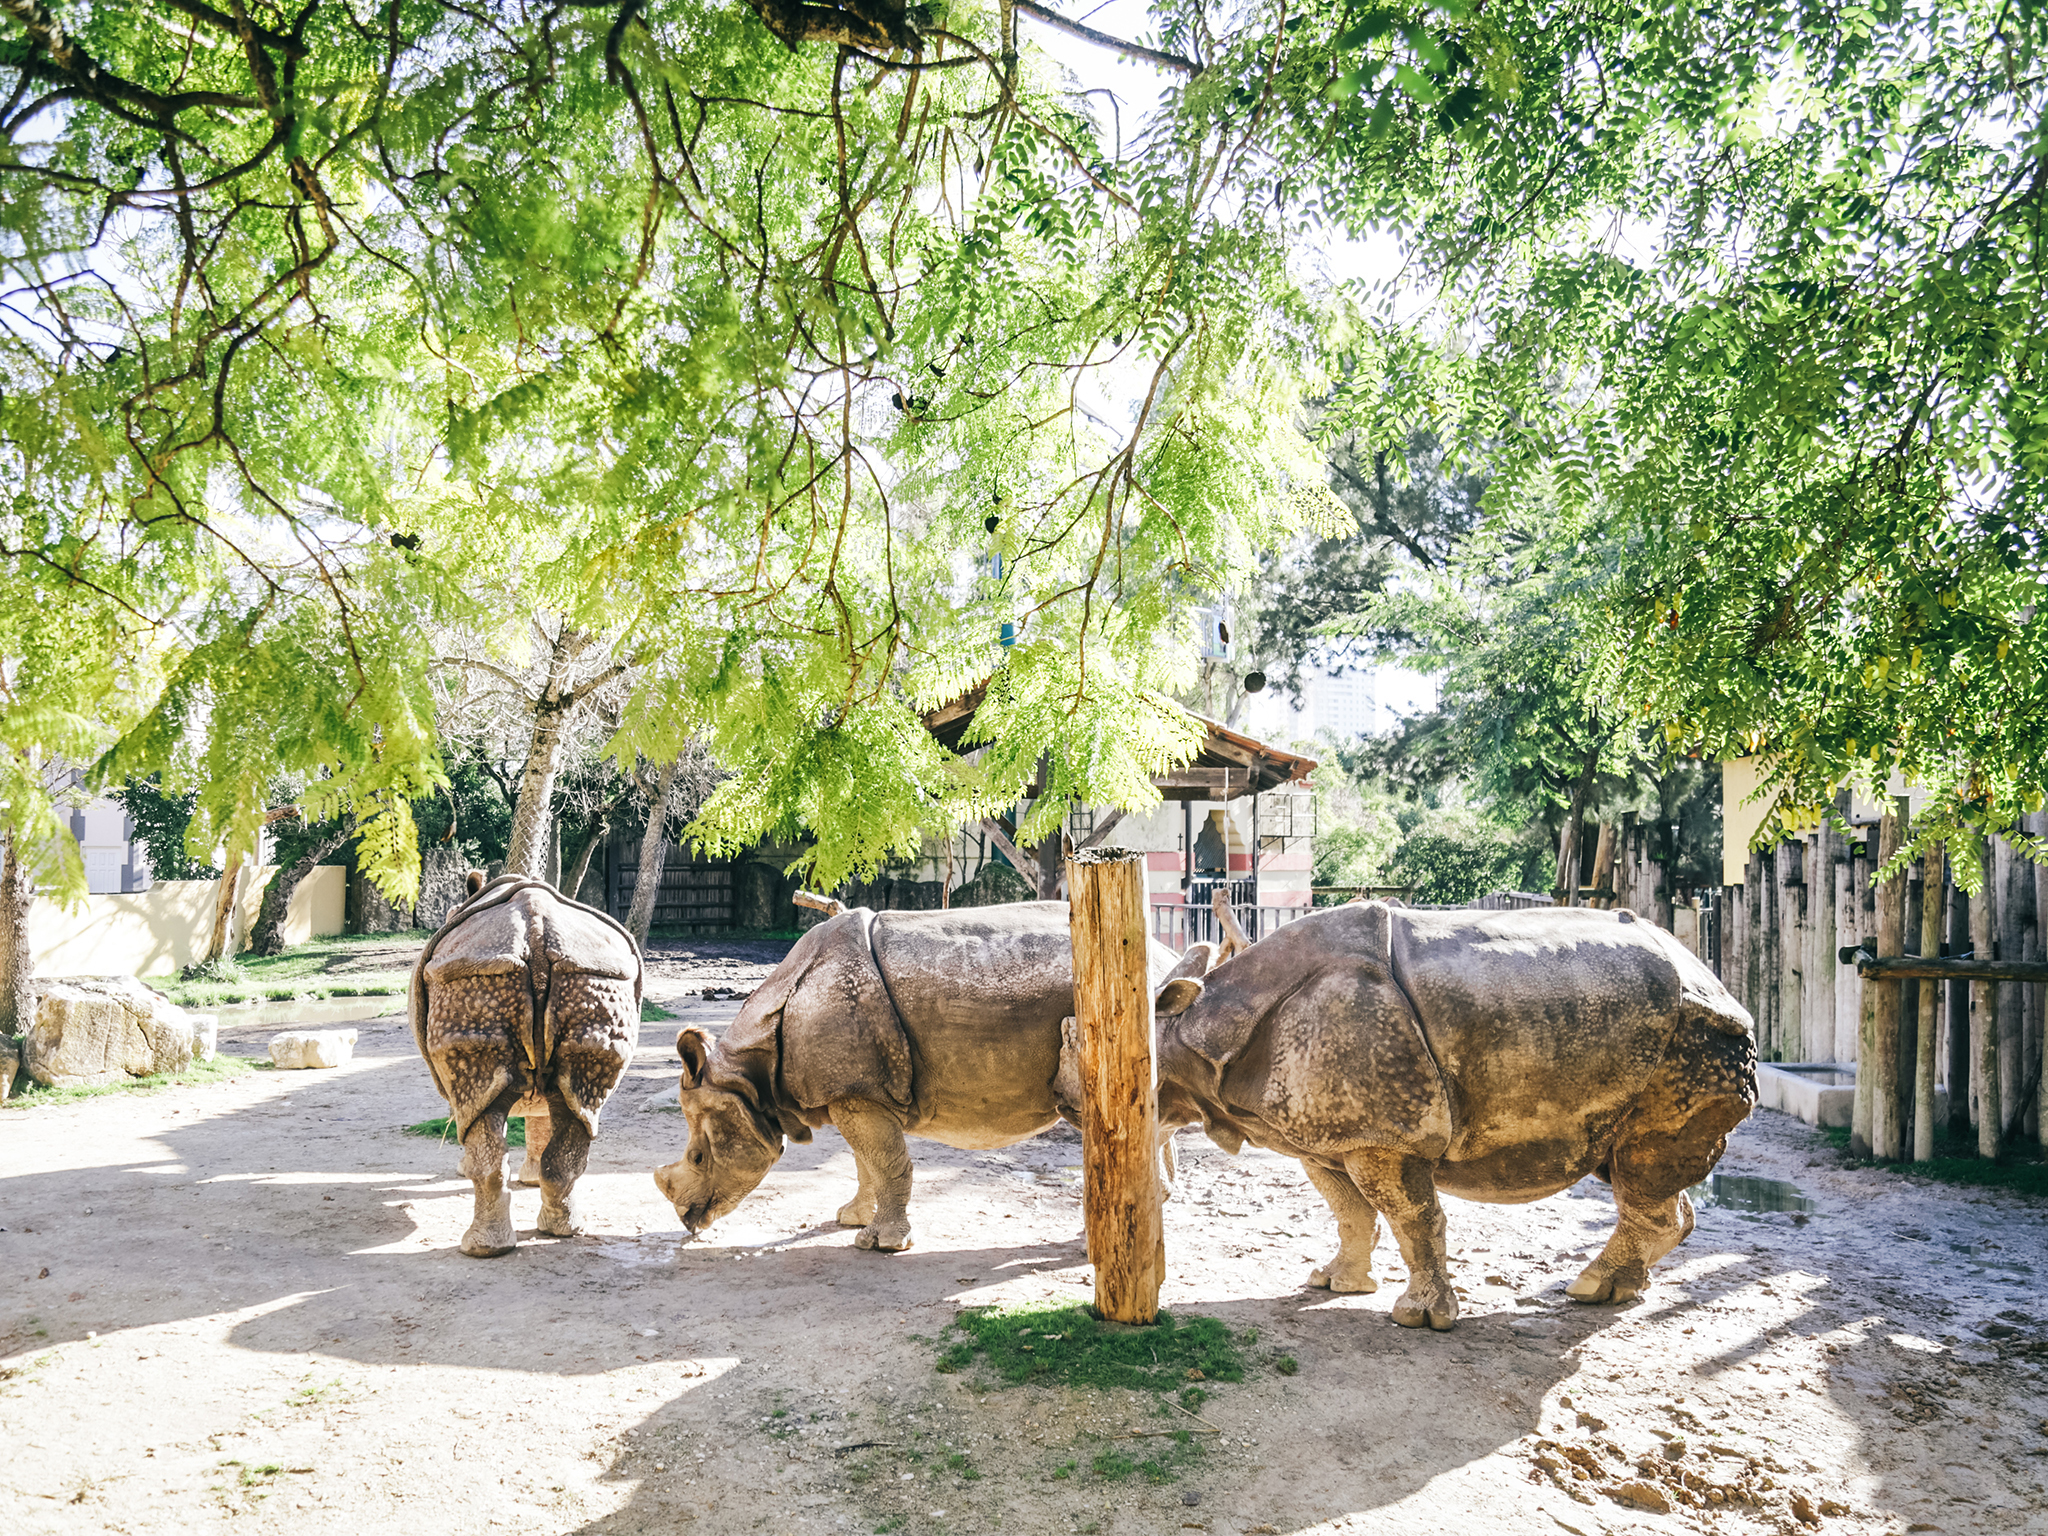 Animais, Jardim Zoológico de Lisboa, Rinocerontes